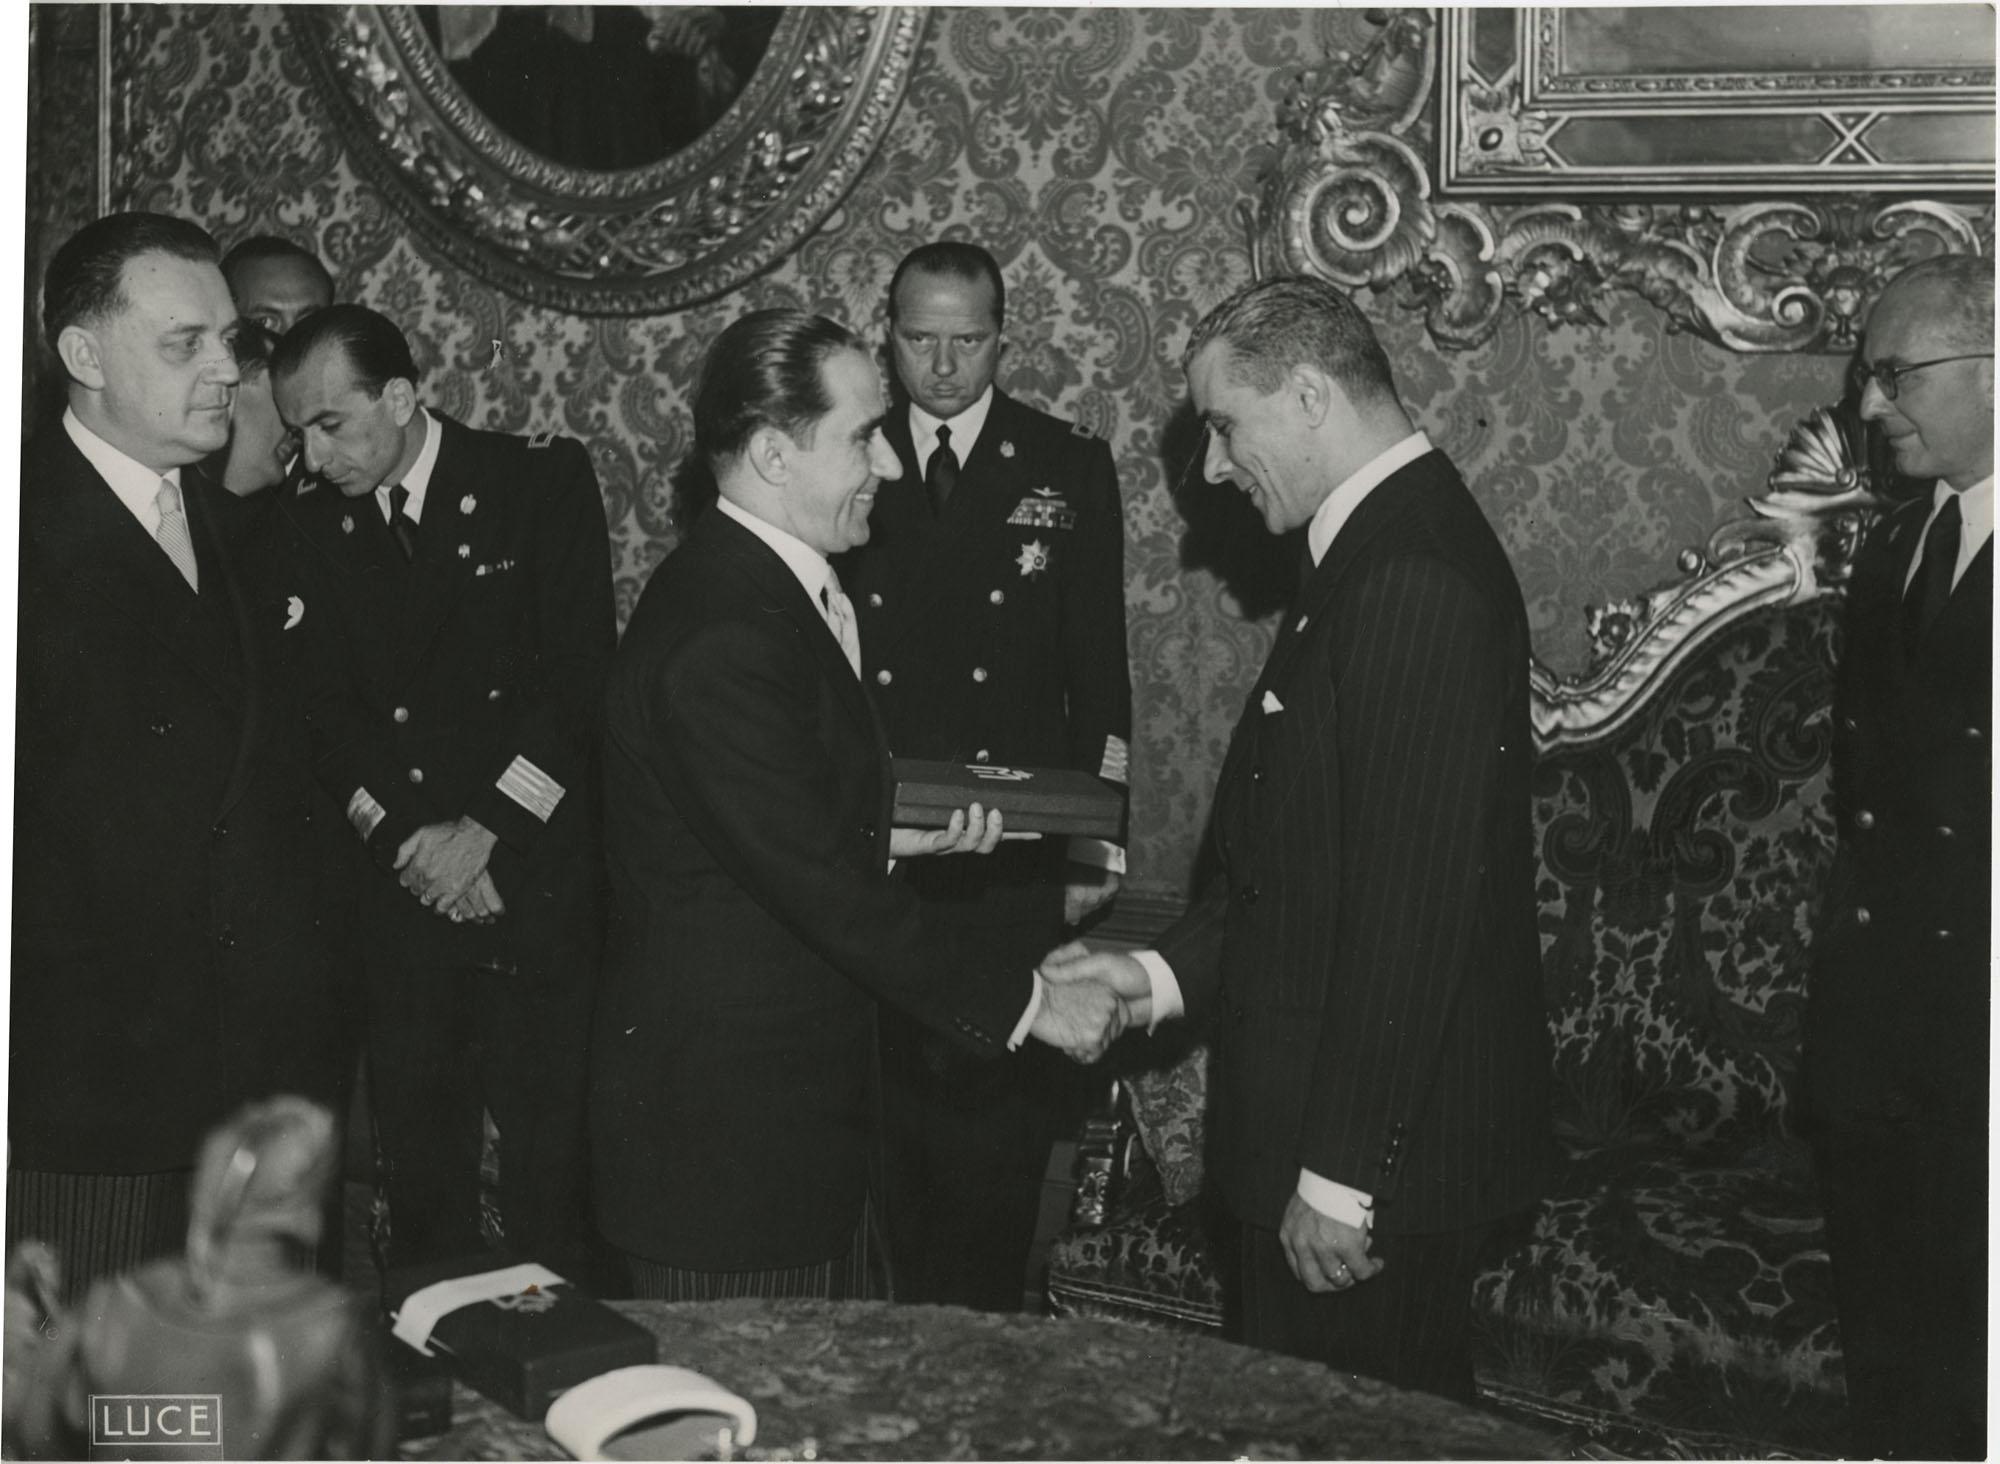 Mihai Antonescu's visit to Benito Mussolini, Photograph 2